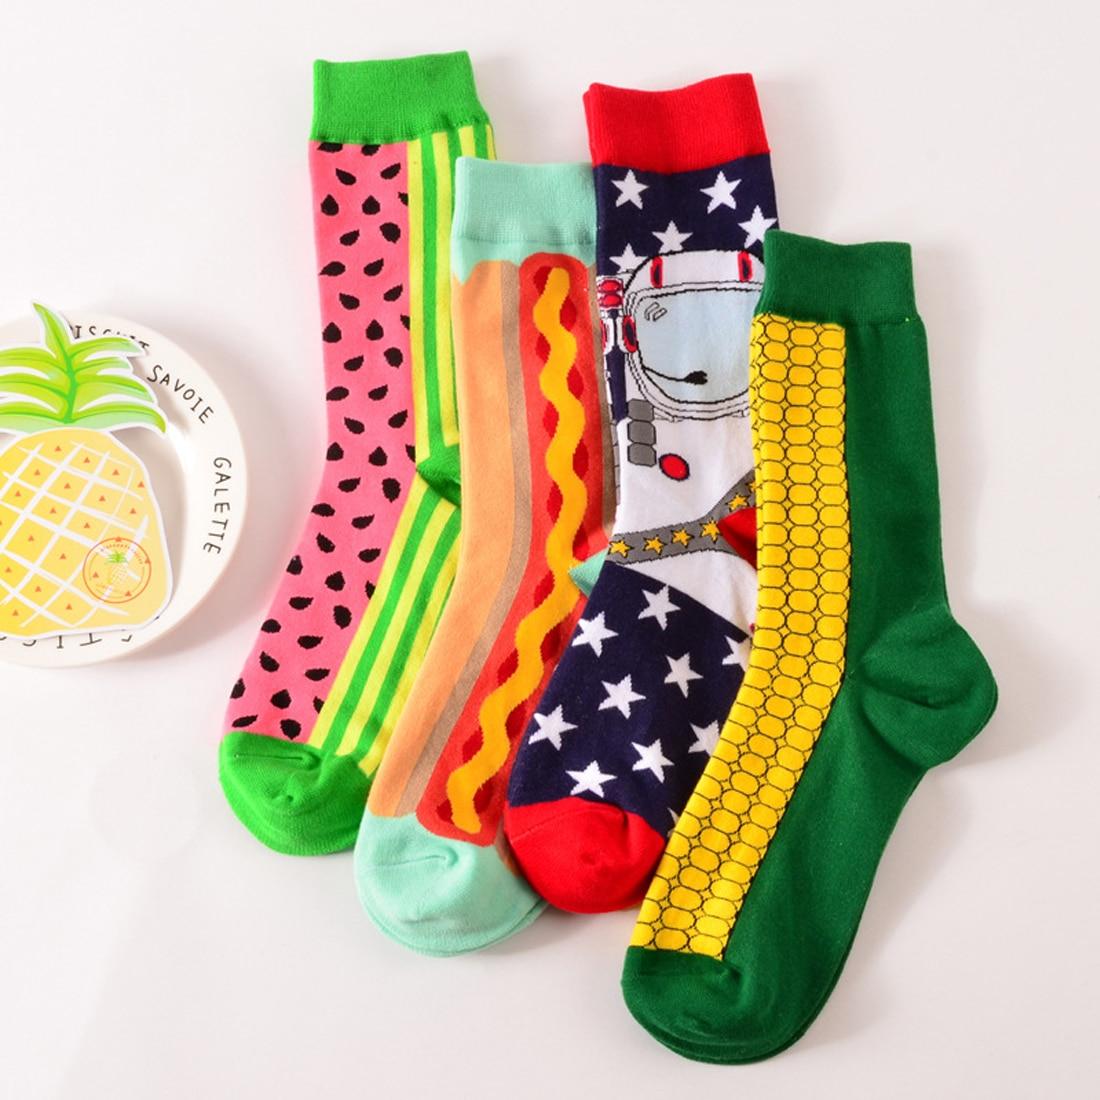 Colourful Crew Cotton Happy Socks Men/Women British Style Casual Harajuku Designer Brand Novelty Art For Couple Funny